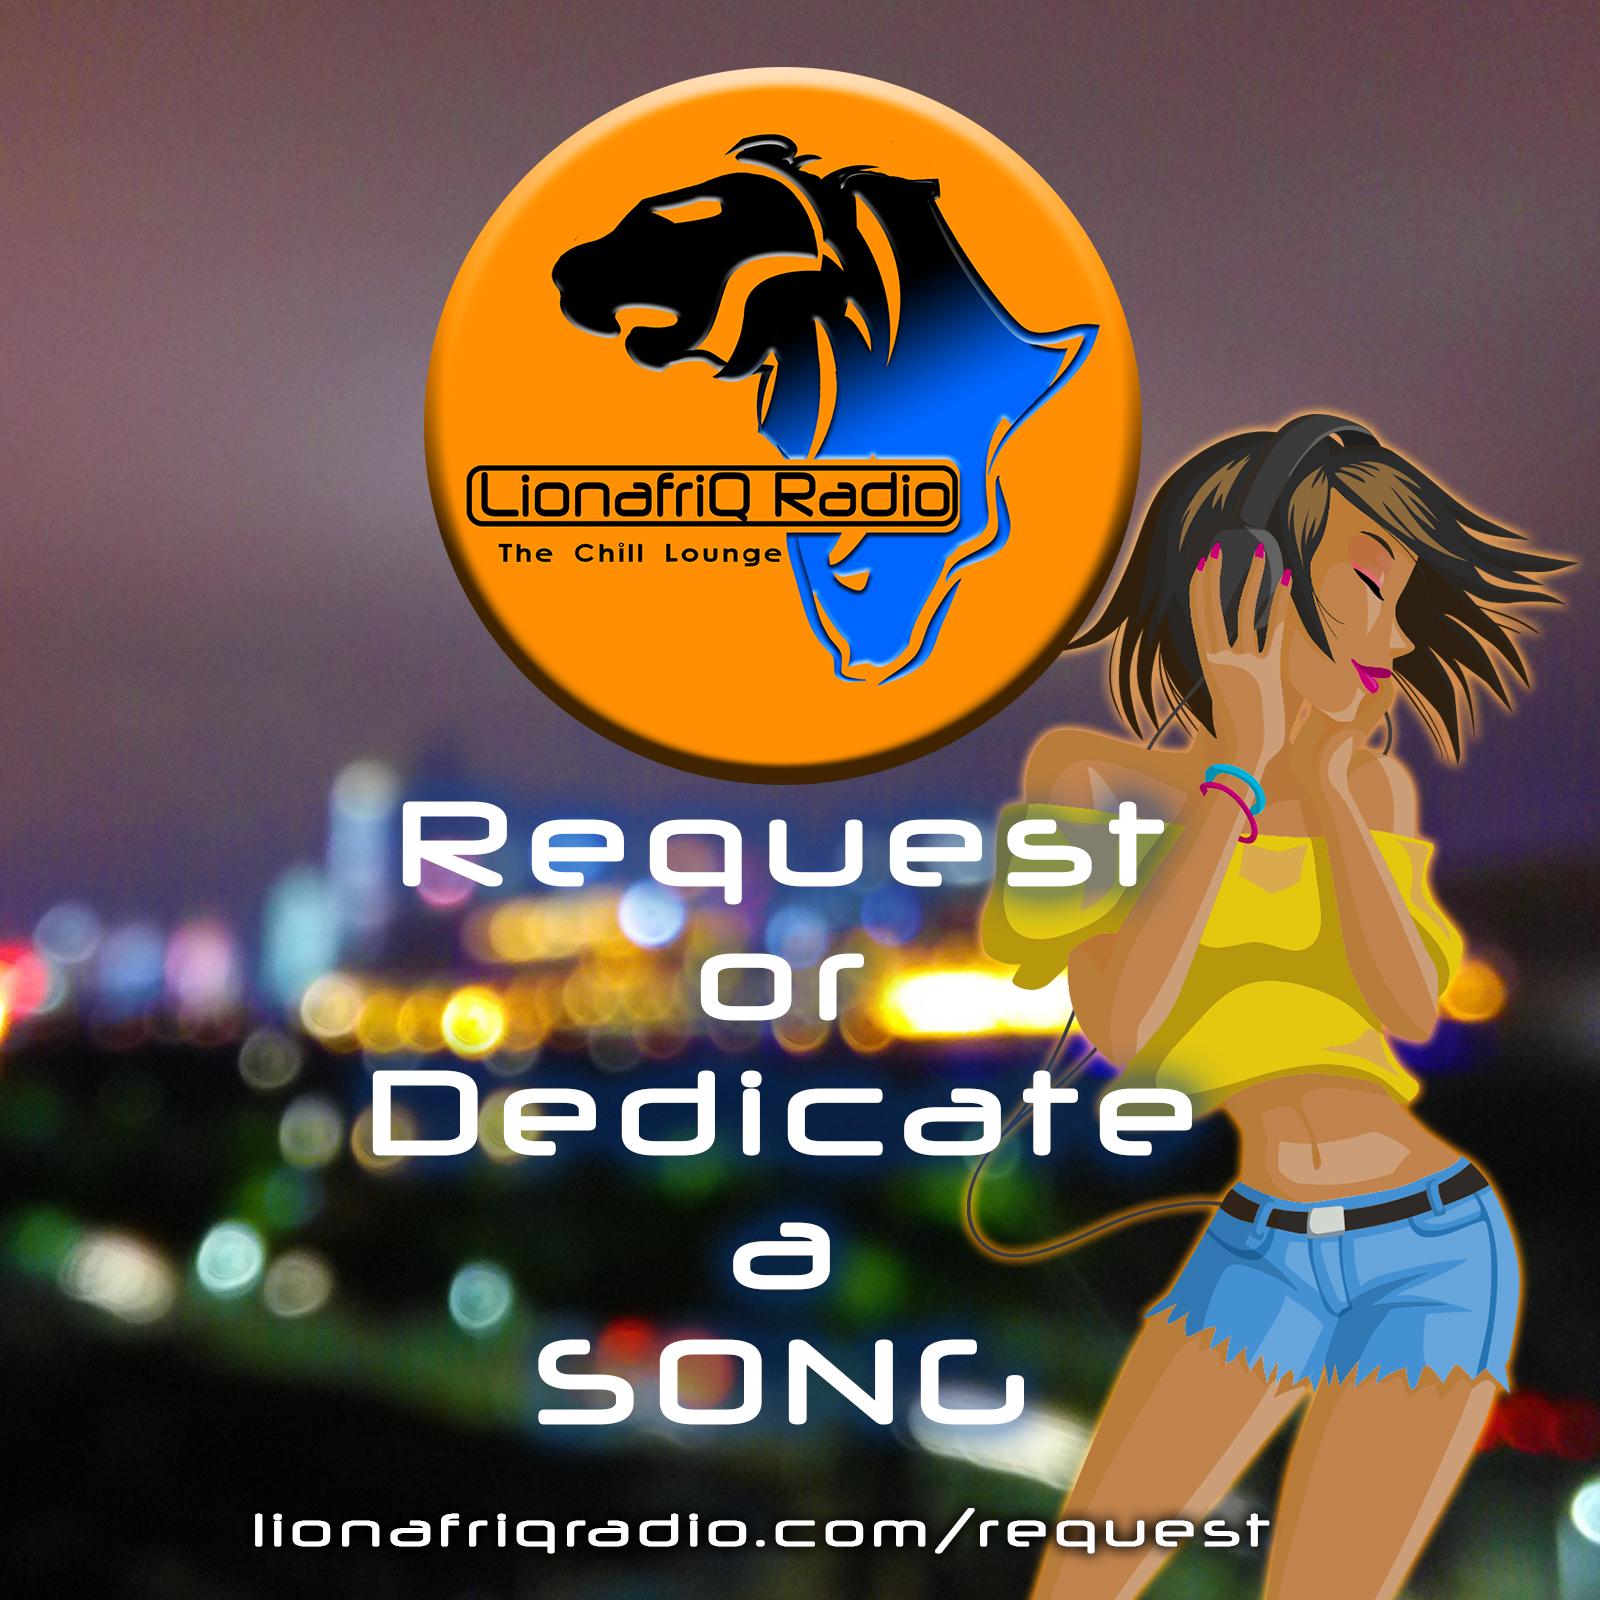 https://www.lionafriqradio.com